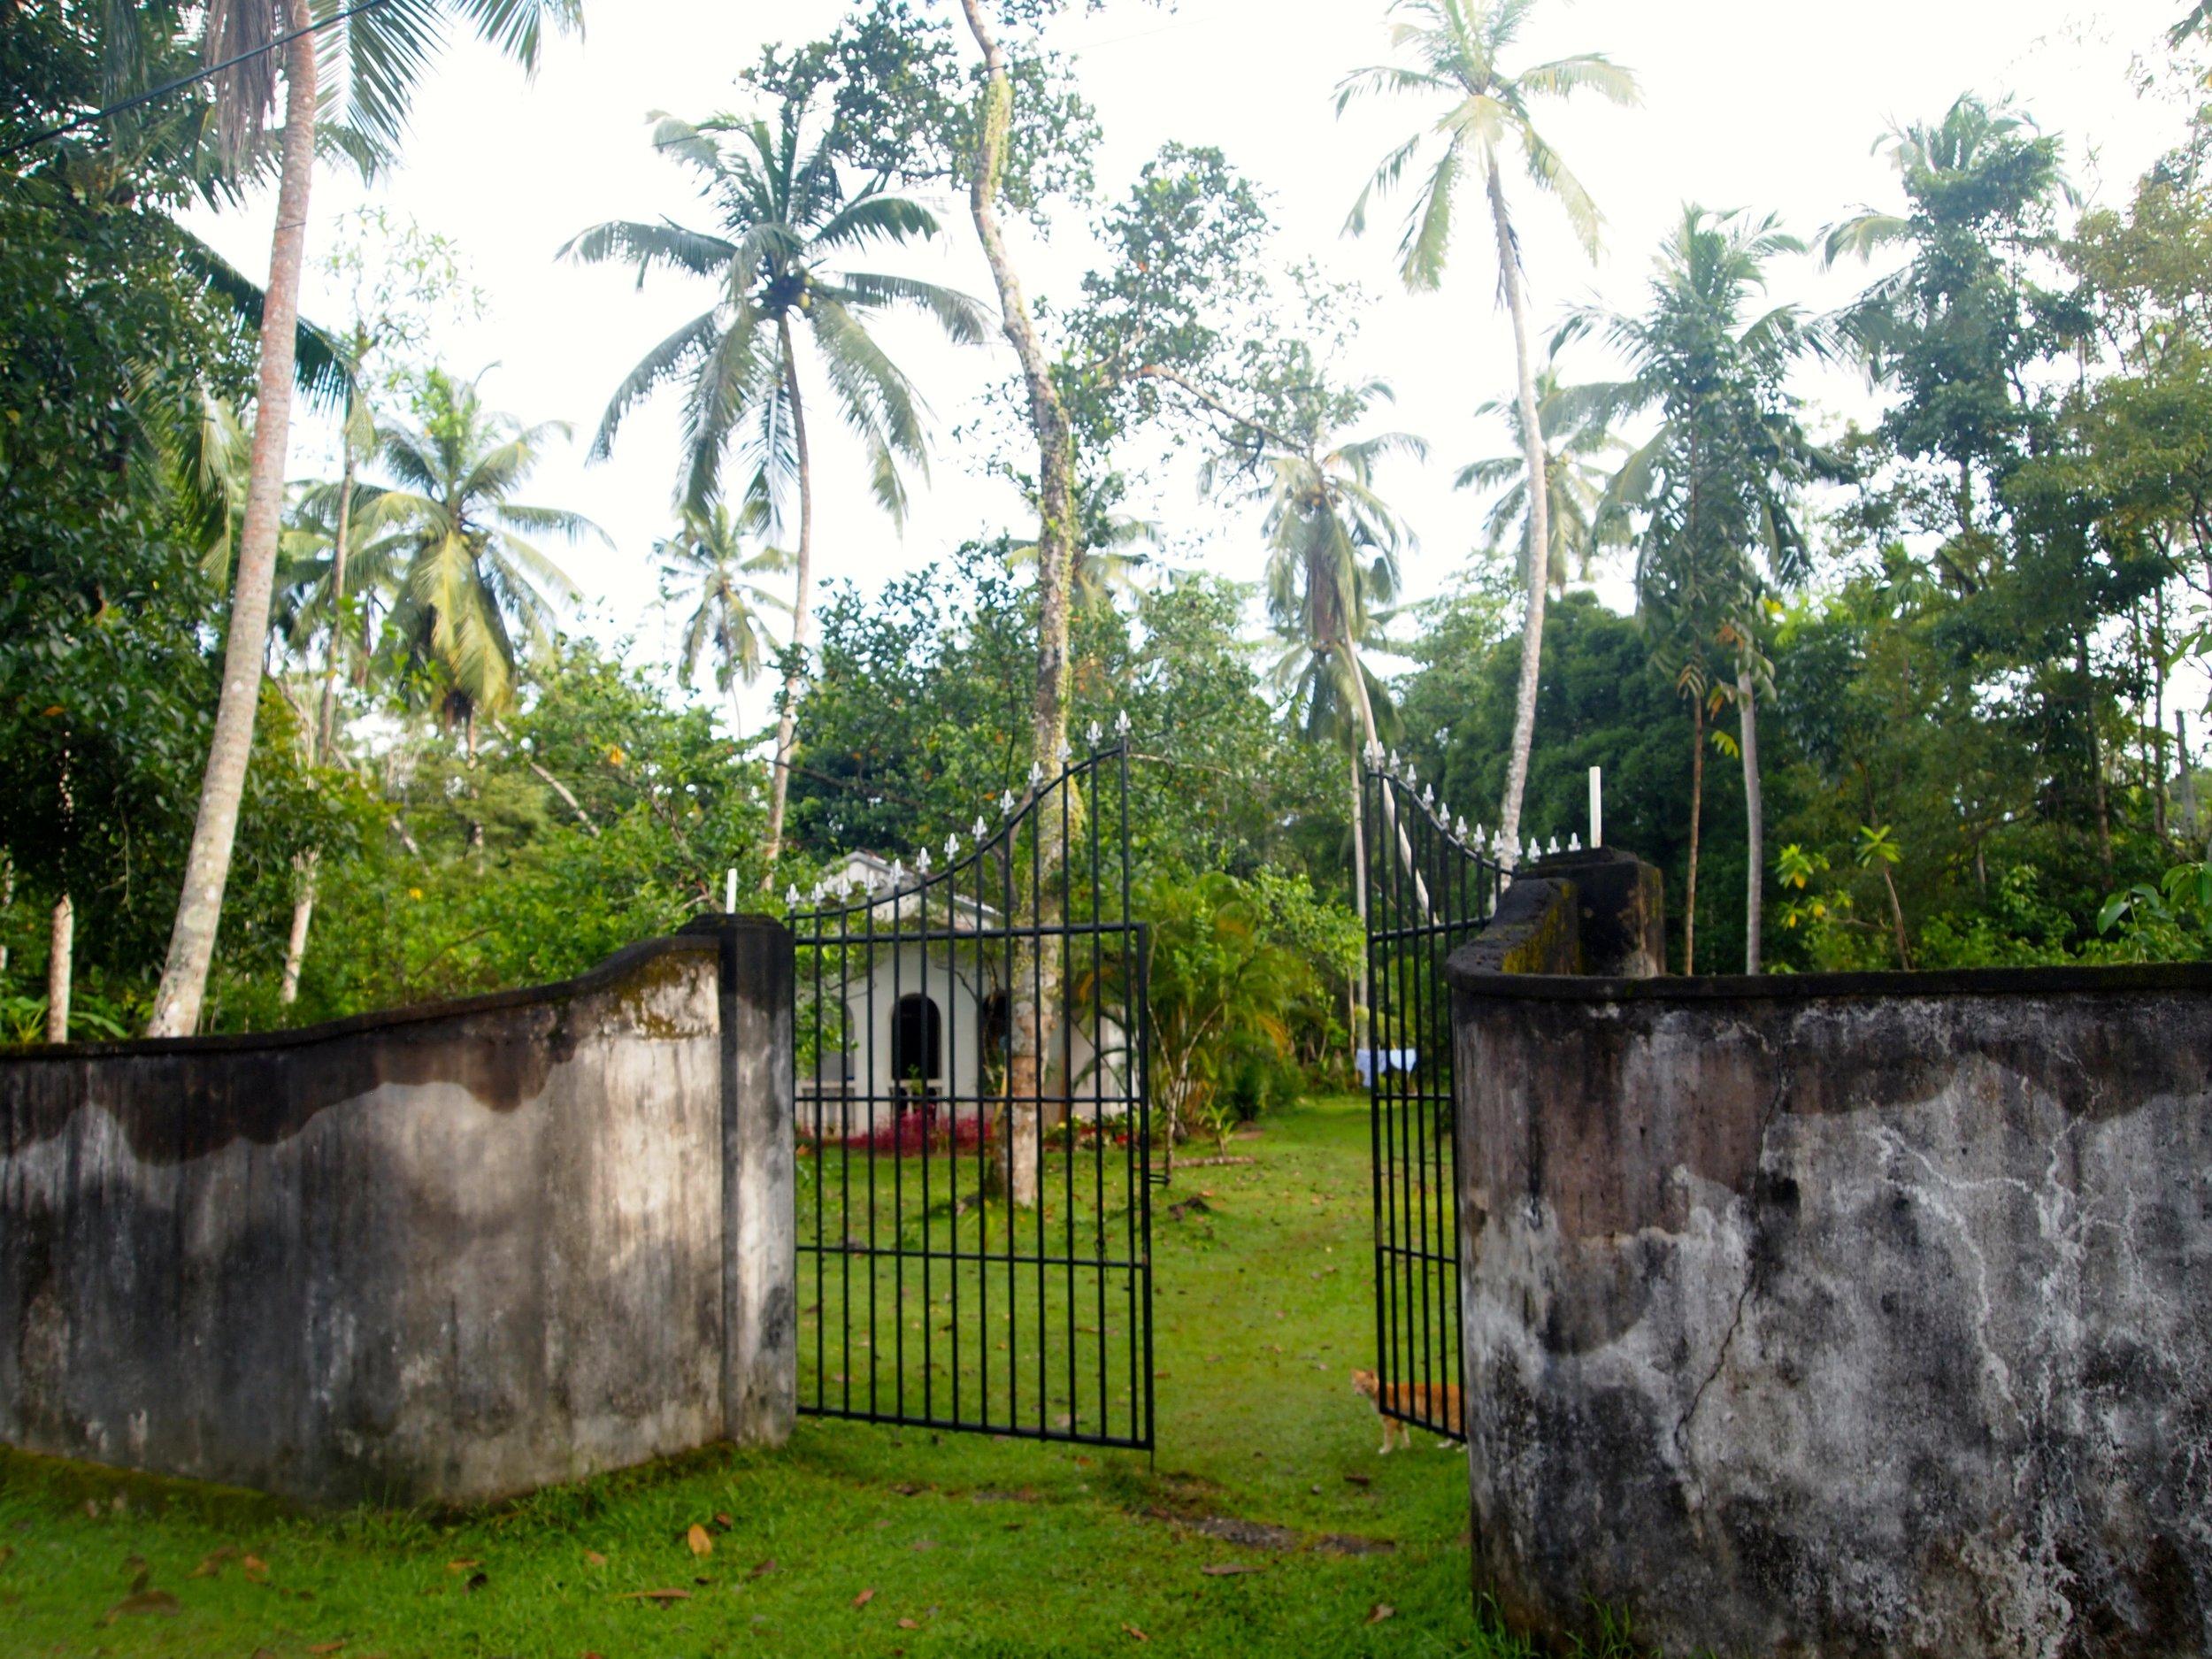 Entrance to Nisala Arana, Bentota, Sri Lanka (image by Jacqui Gibson).